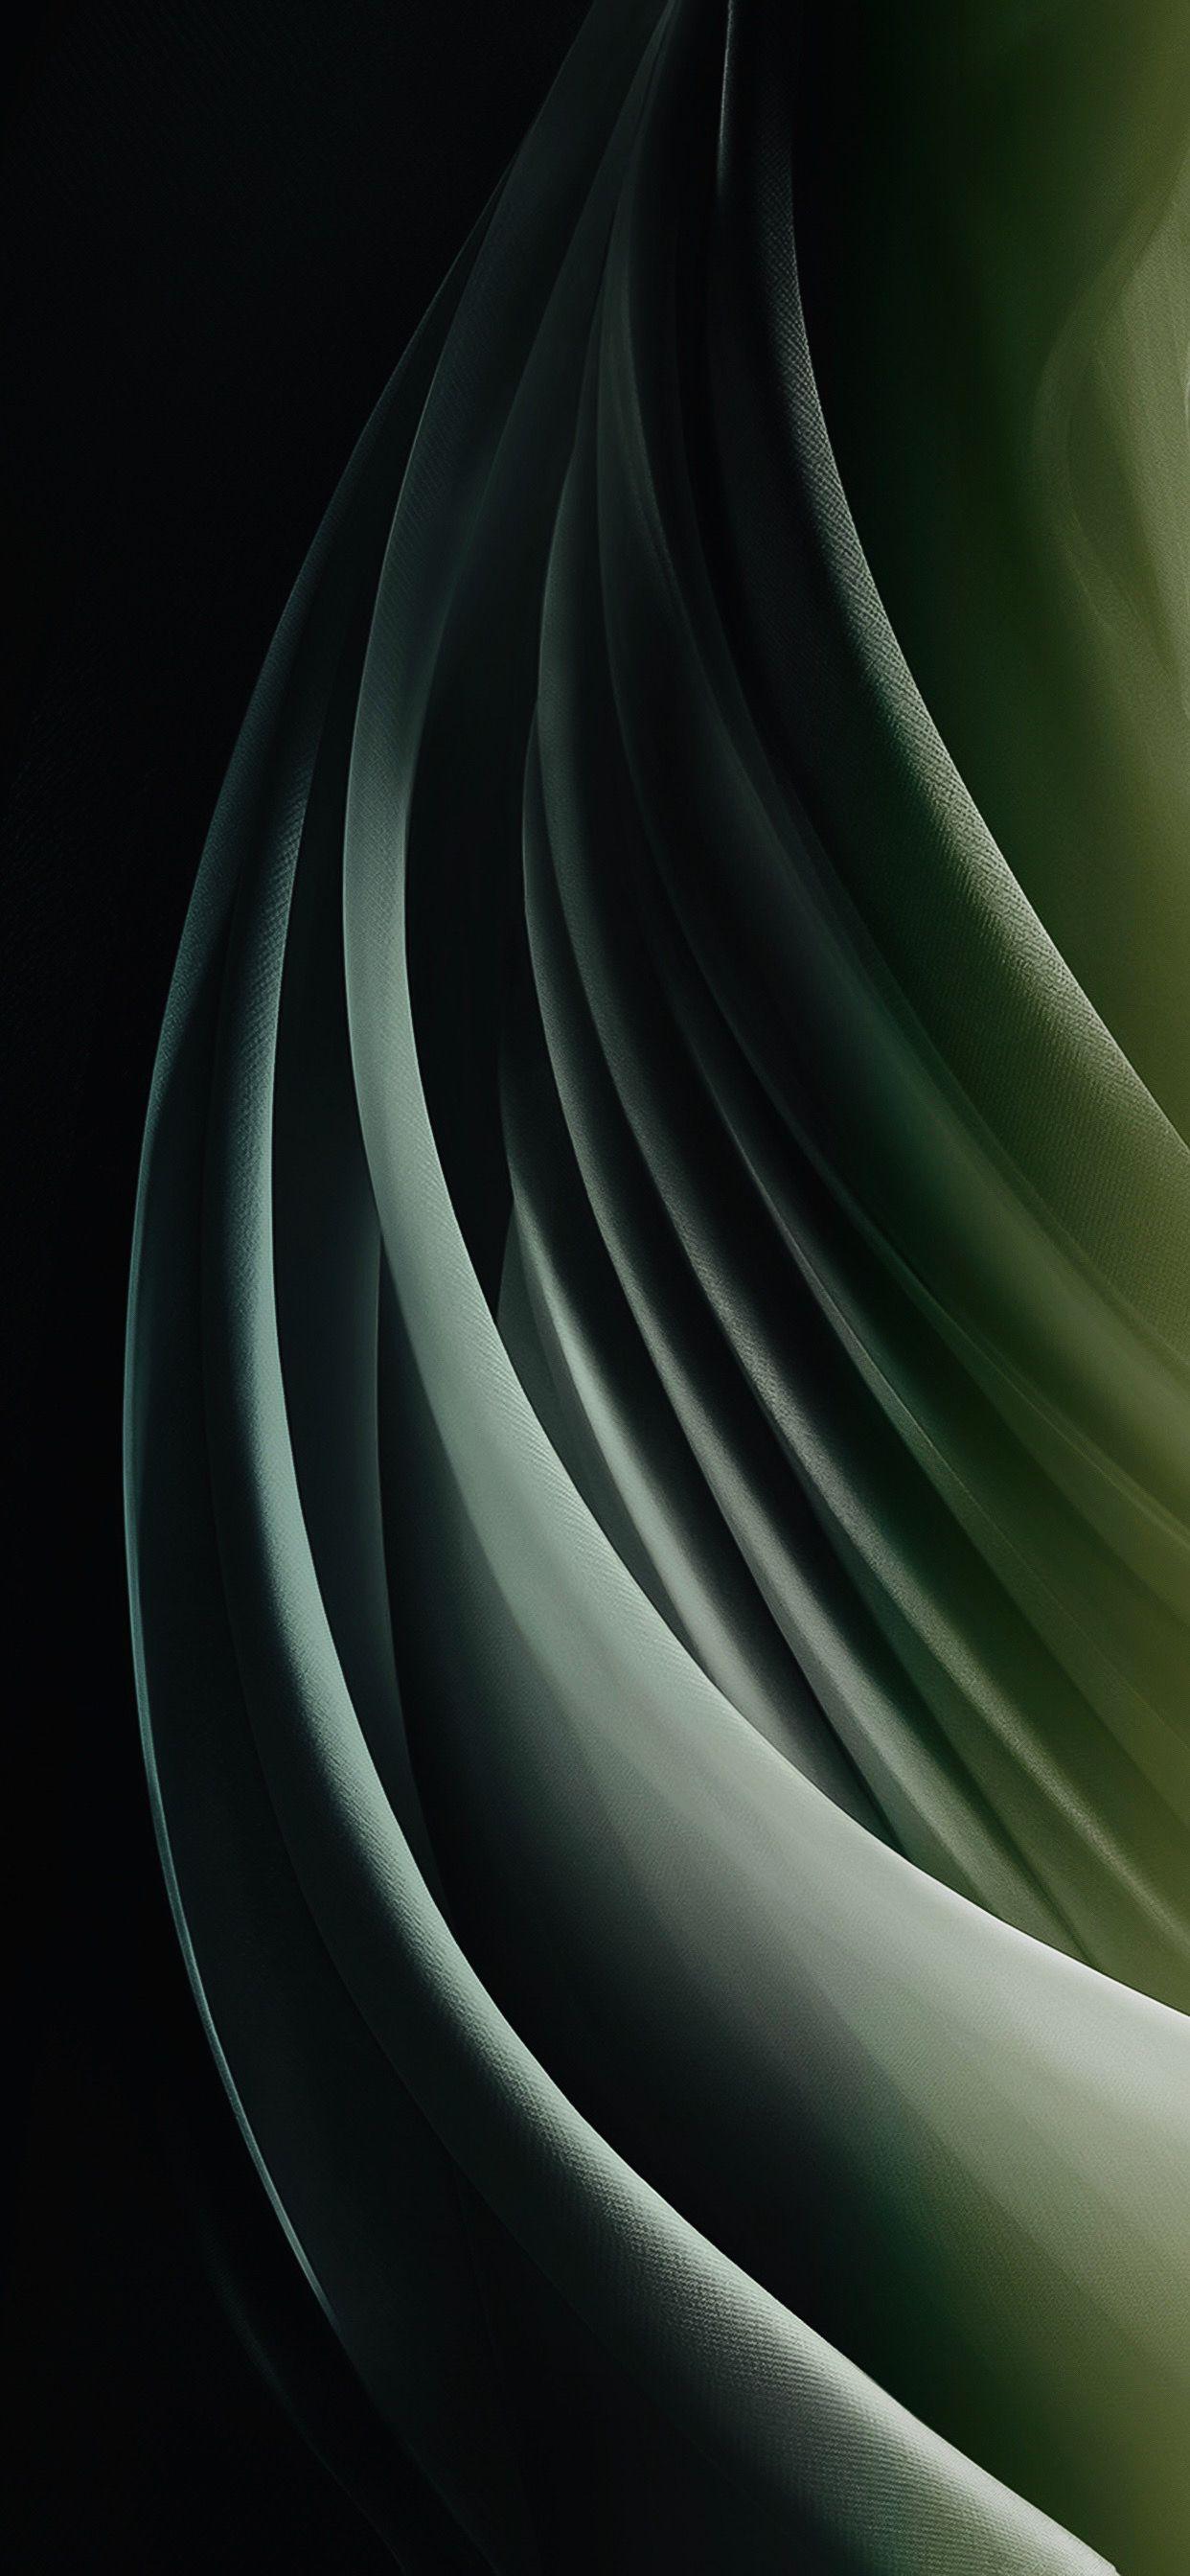 Ios14 Concept V8 Midnight Green Dark Galaxy Phone Wallpaper Abstract Wallpaper Backgrounds Cellphone Wallpaper